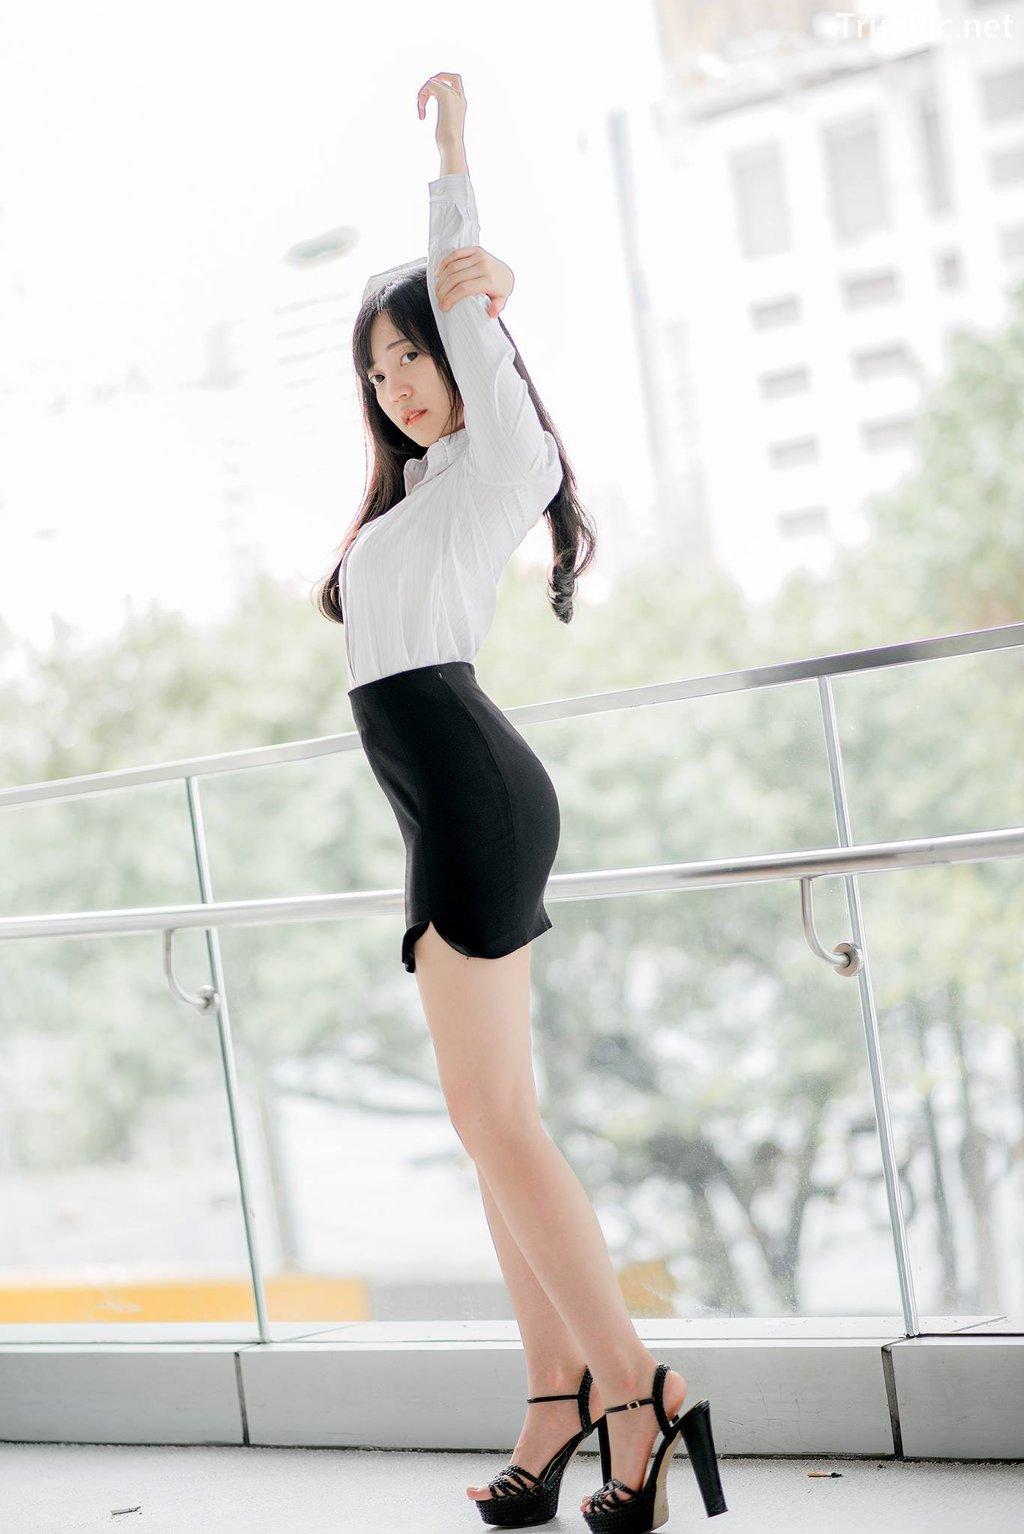 Image Thailand Model - Sarunrat Baifern Ong - Concept Kim's Secretary - TruePic.net - Picture-9